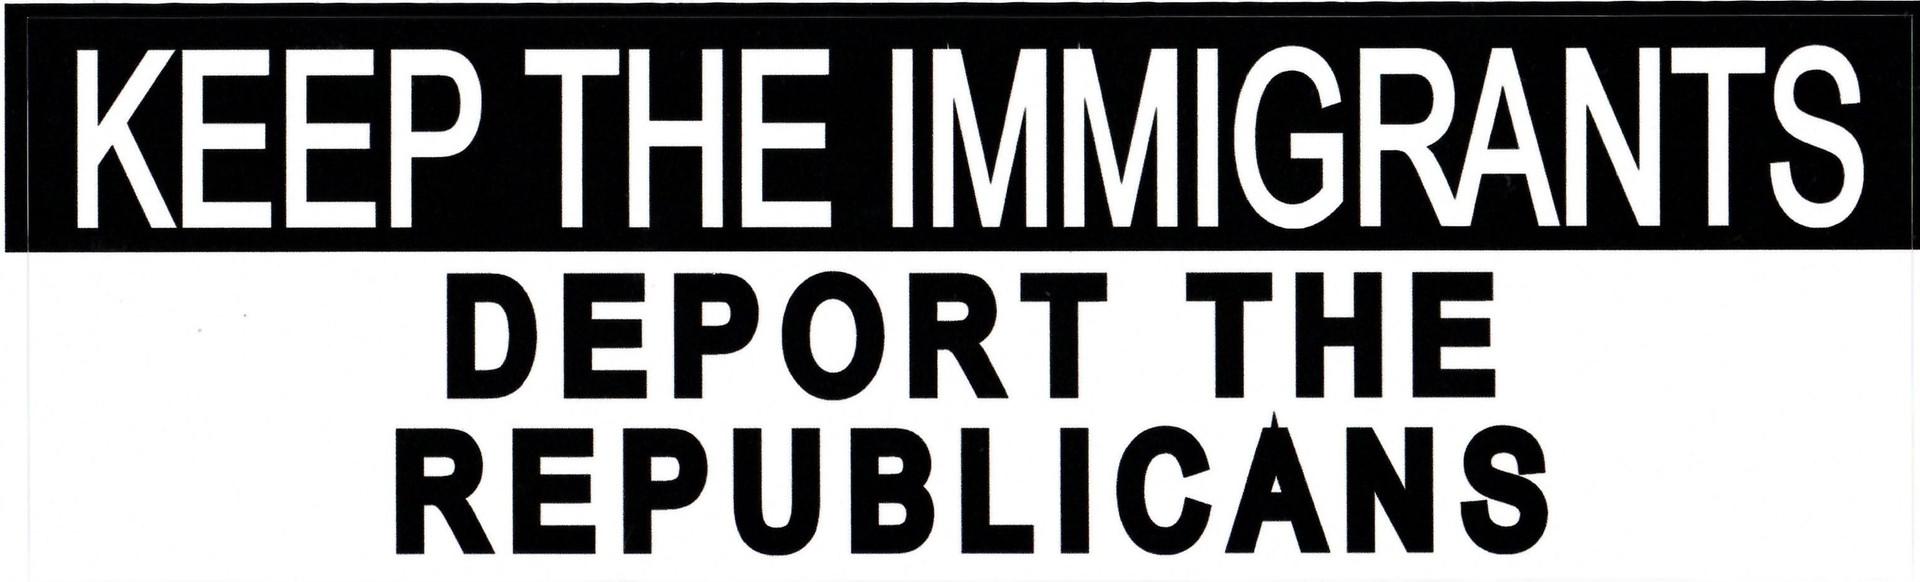 Keep The Immigrants Deport Republicans